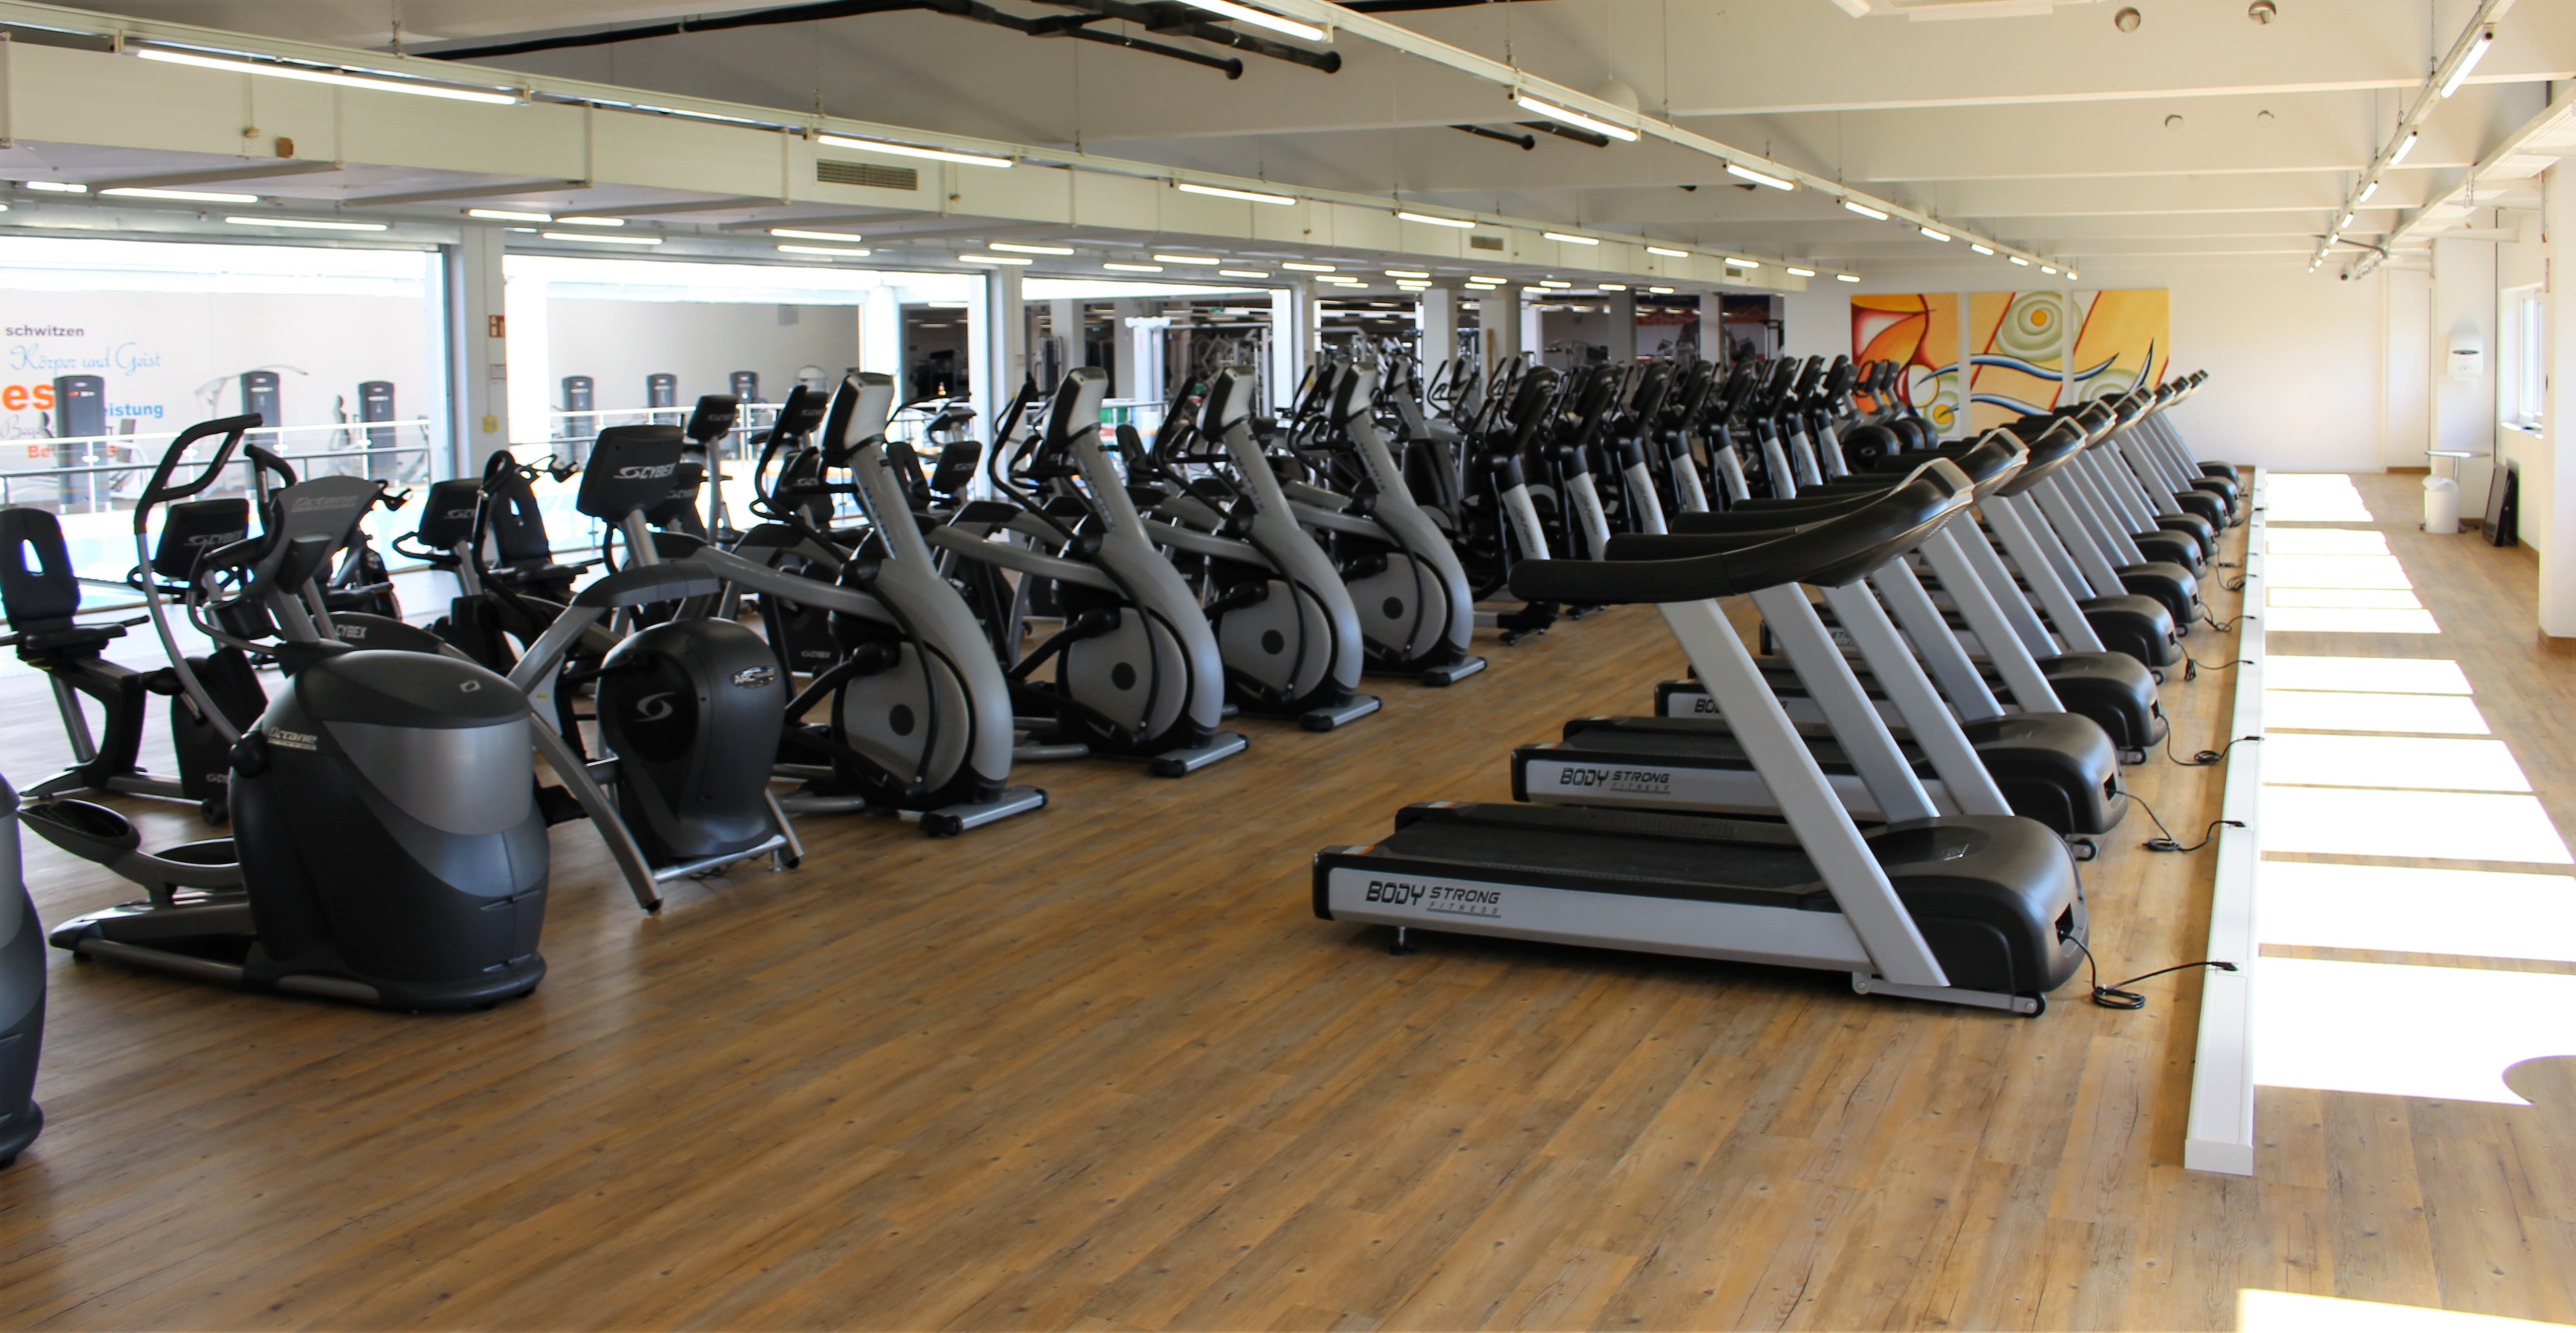 Cardiotraining Bodyfeeling Fitness